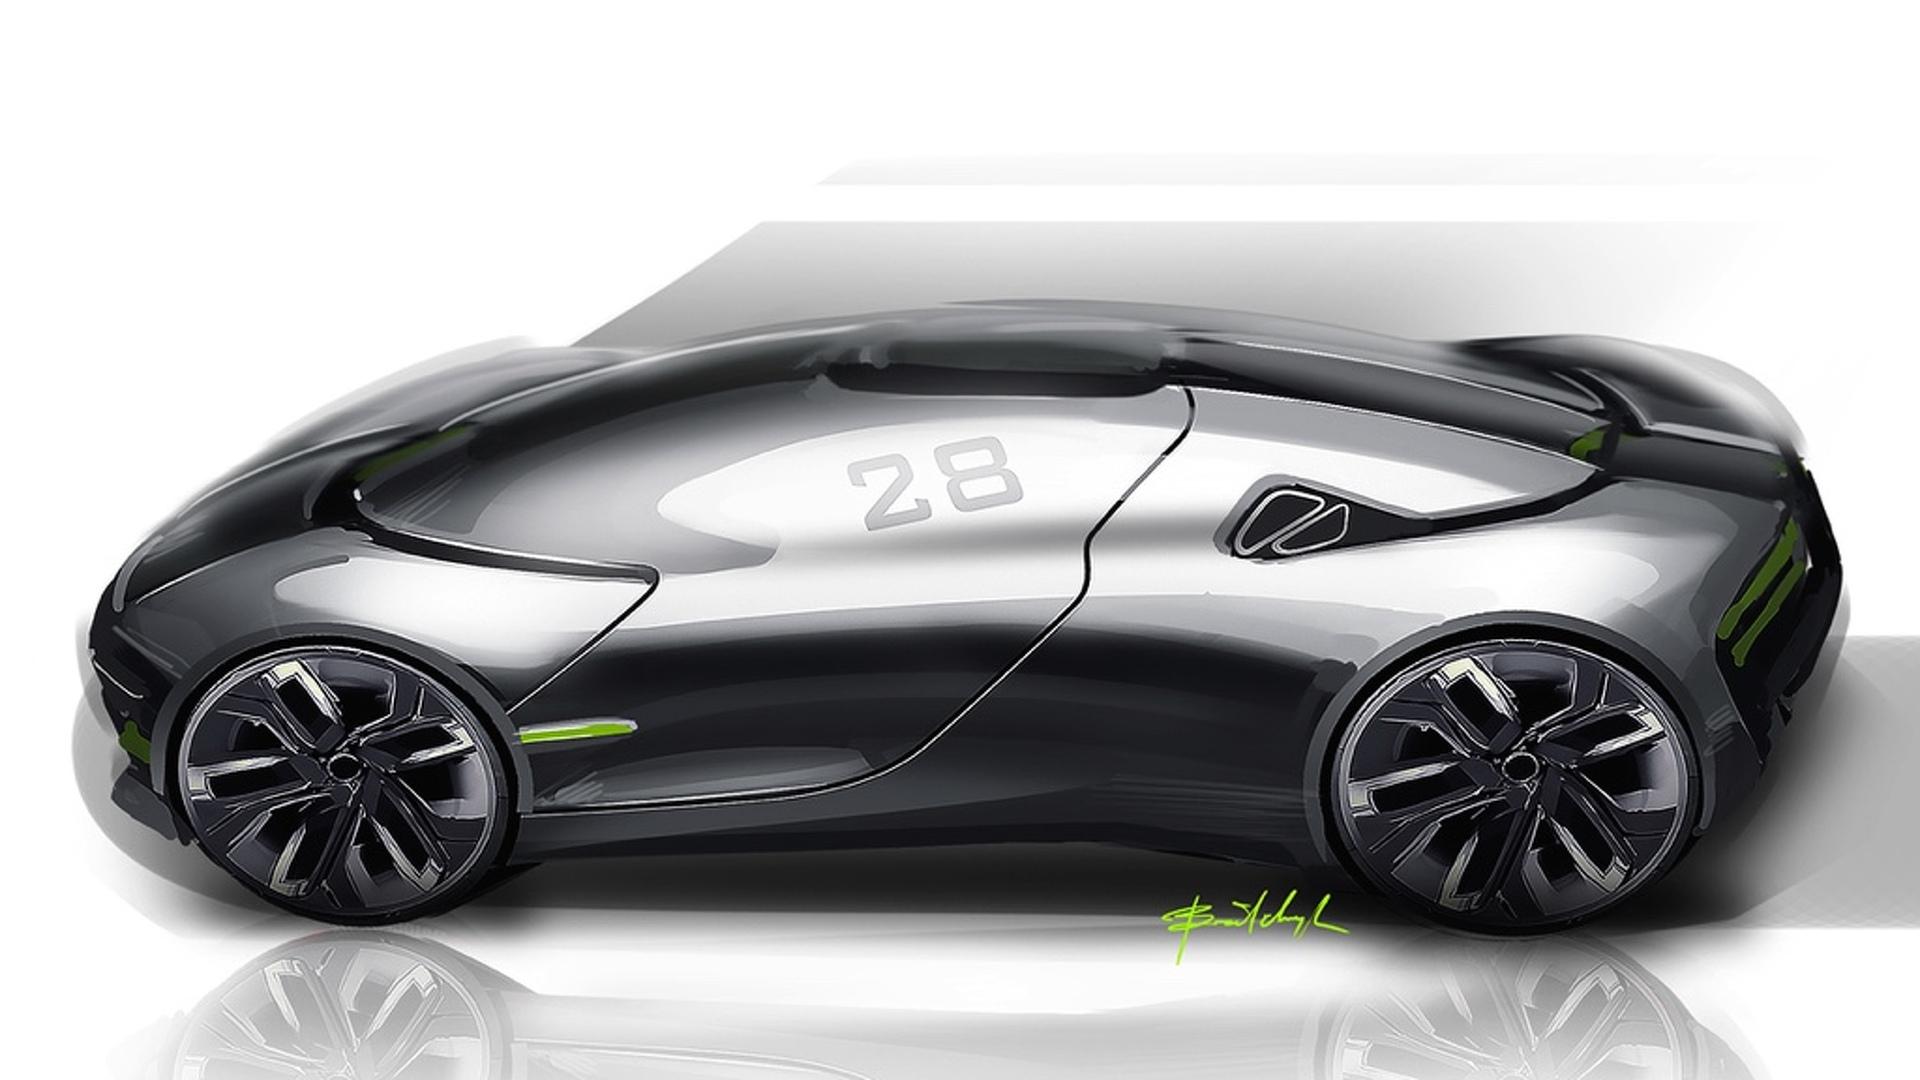 THX Concept Envisaged As Future EV Sports Car